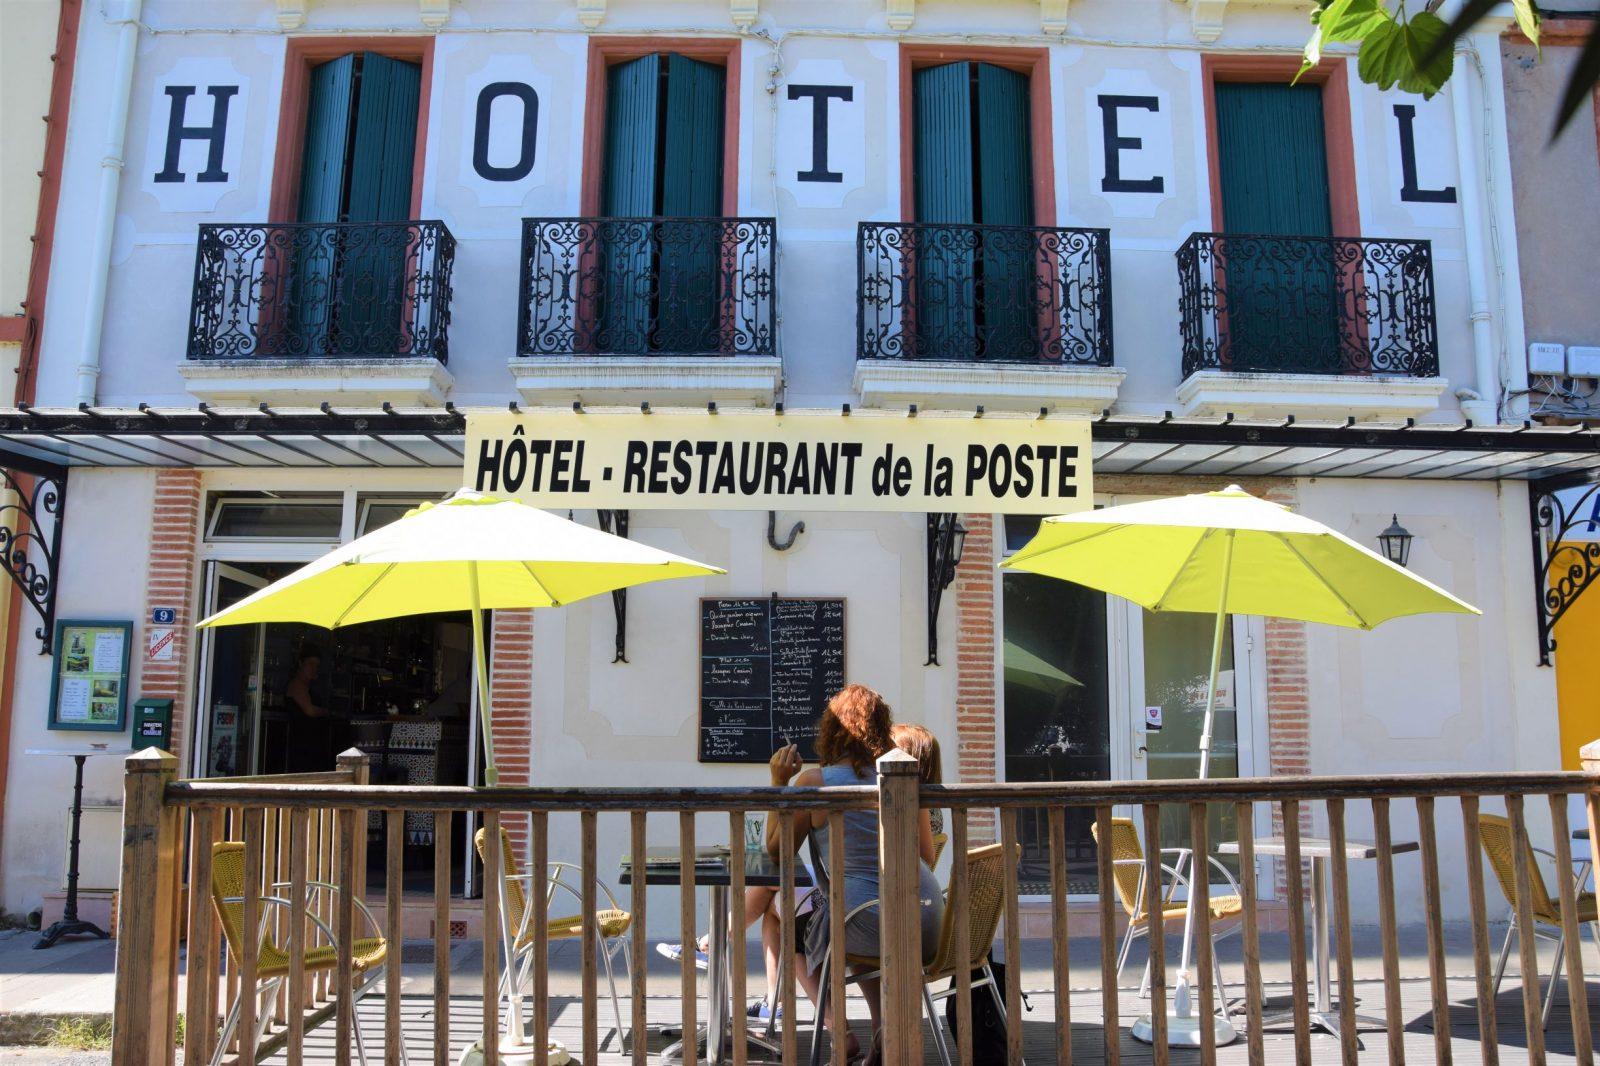 Hôtel Bar Restaurant de la Poste